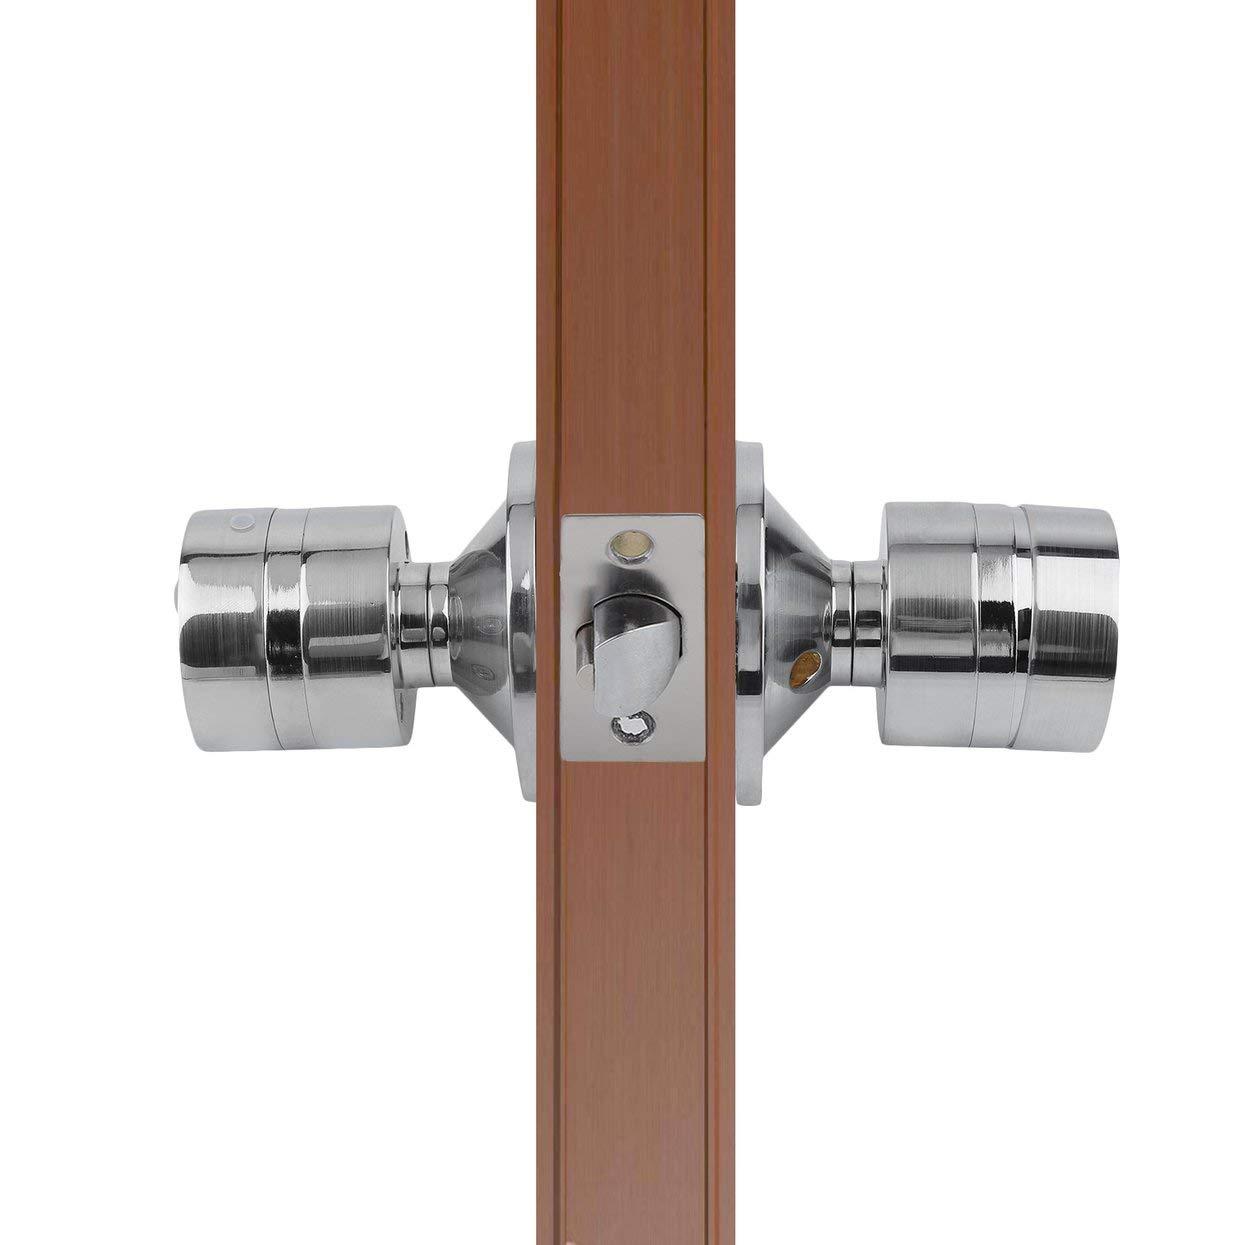 Keyless Electronic Code Password Number Lock Digital Keyless Keypad Security Safety Entry Intelligent Doorlock Silver by ToGames (Image #3)